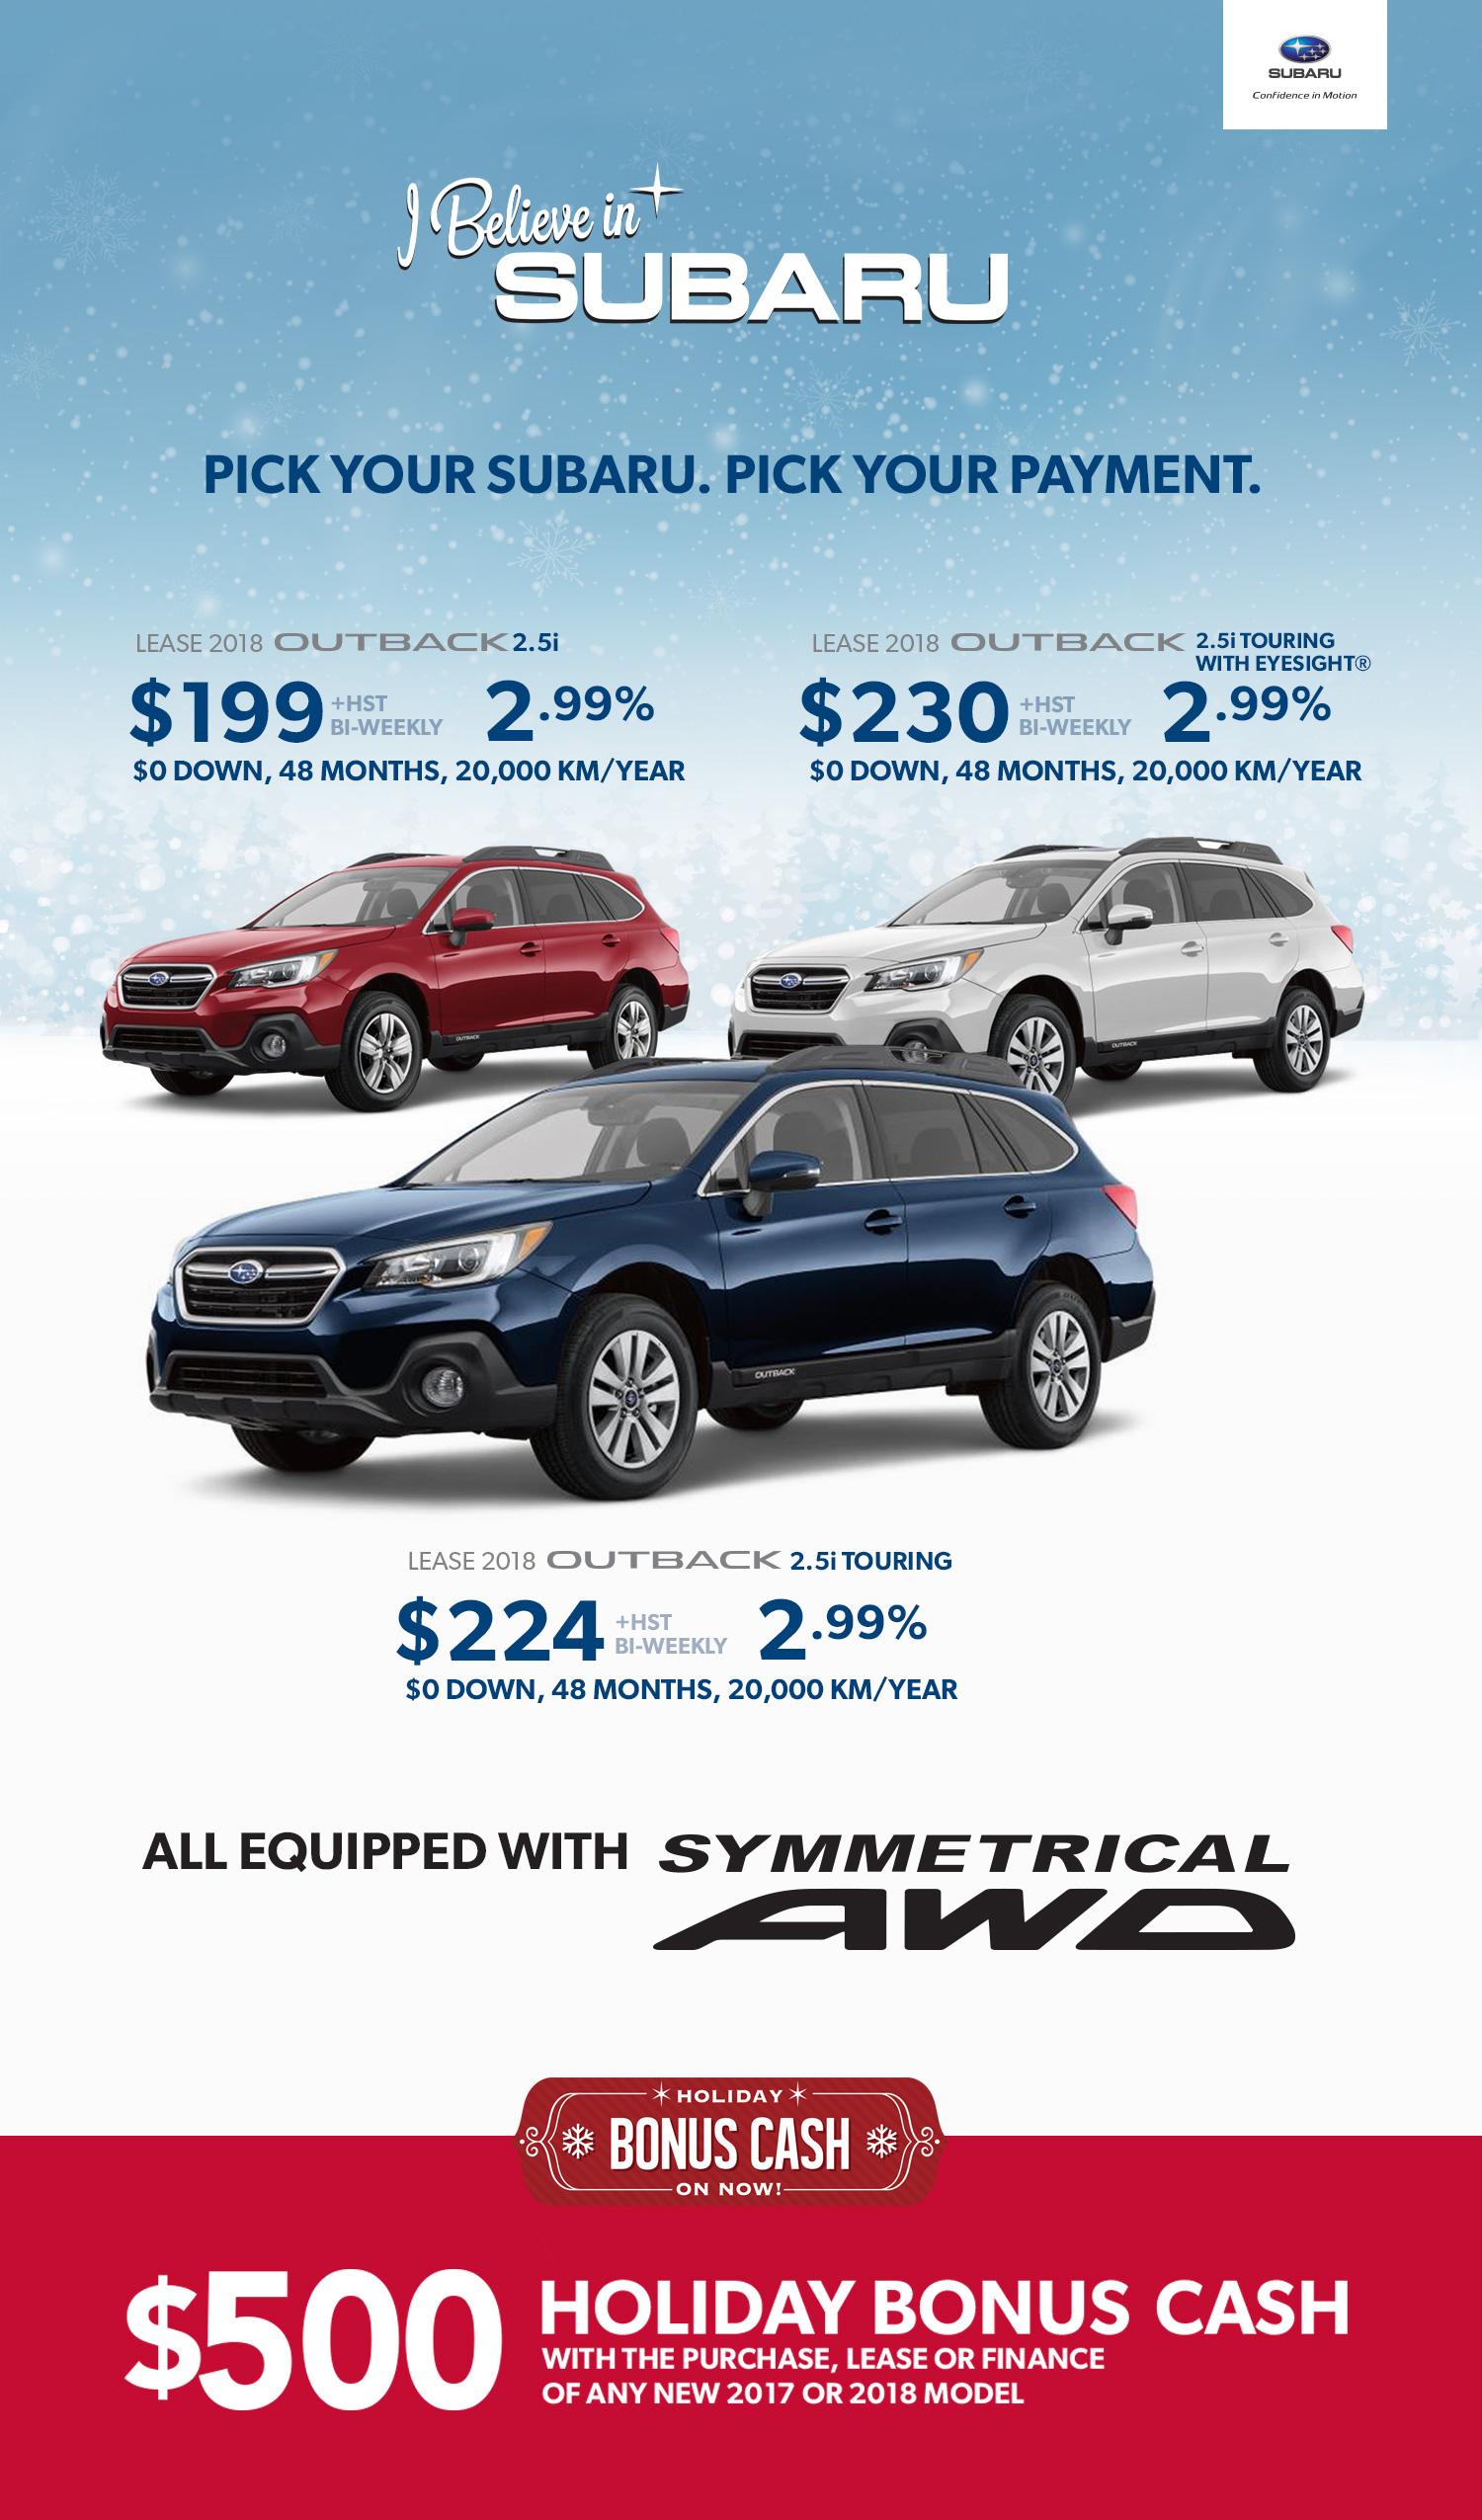 Subaru Outback Holiday Bonus Newmarket